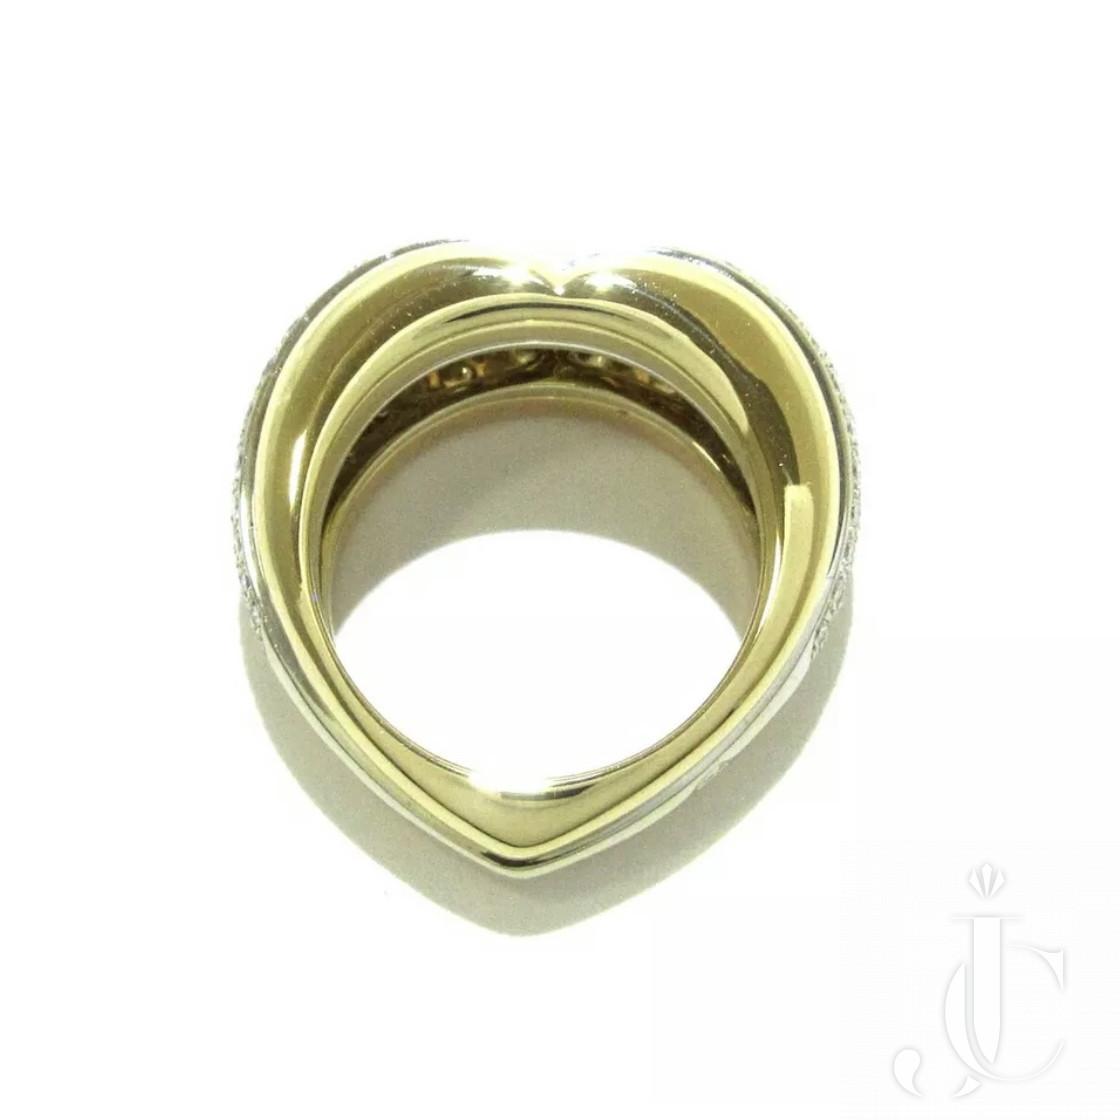 CARTIER Paris ring